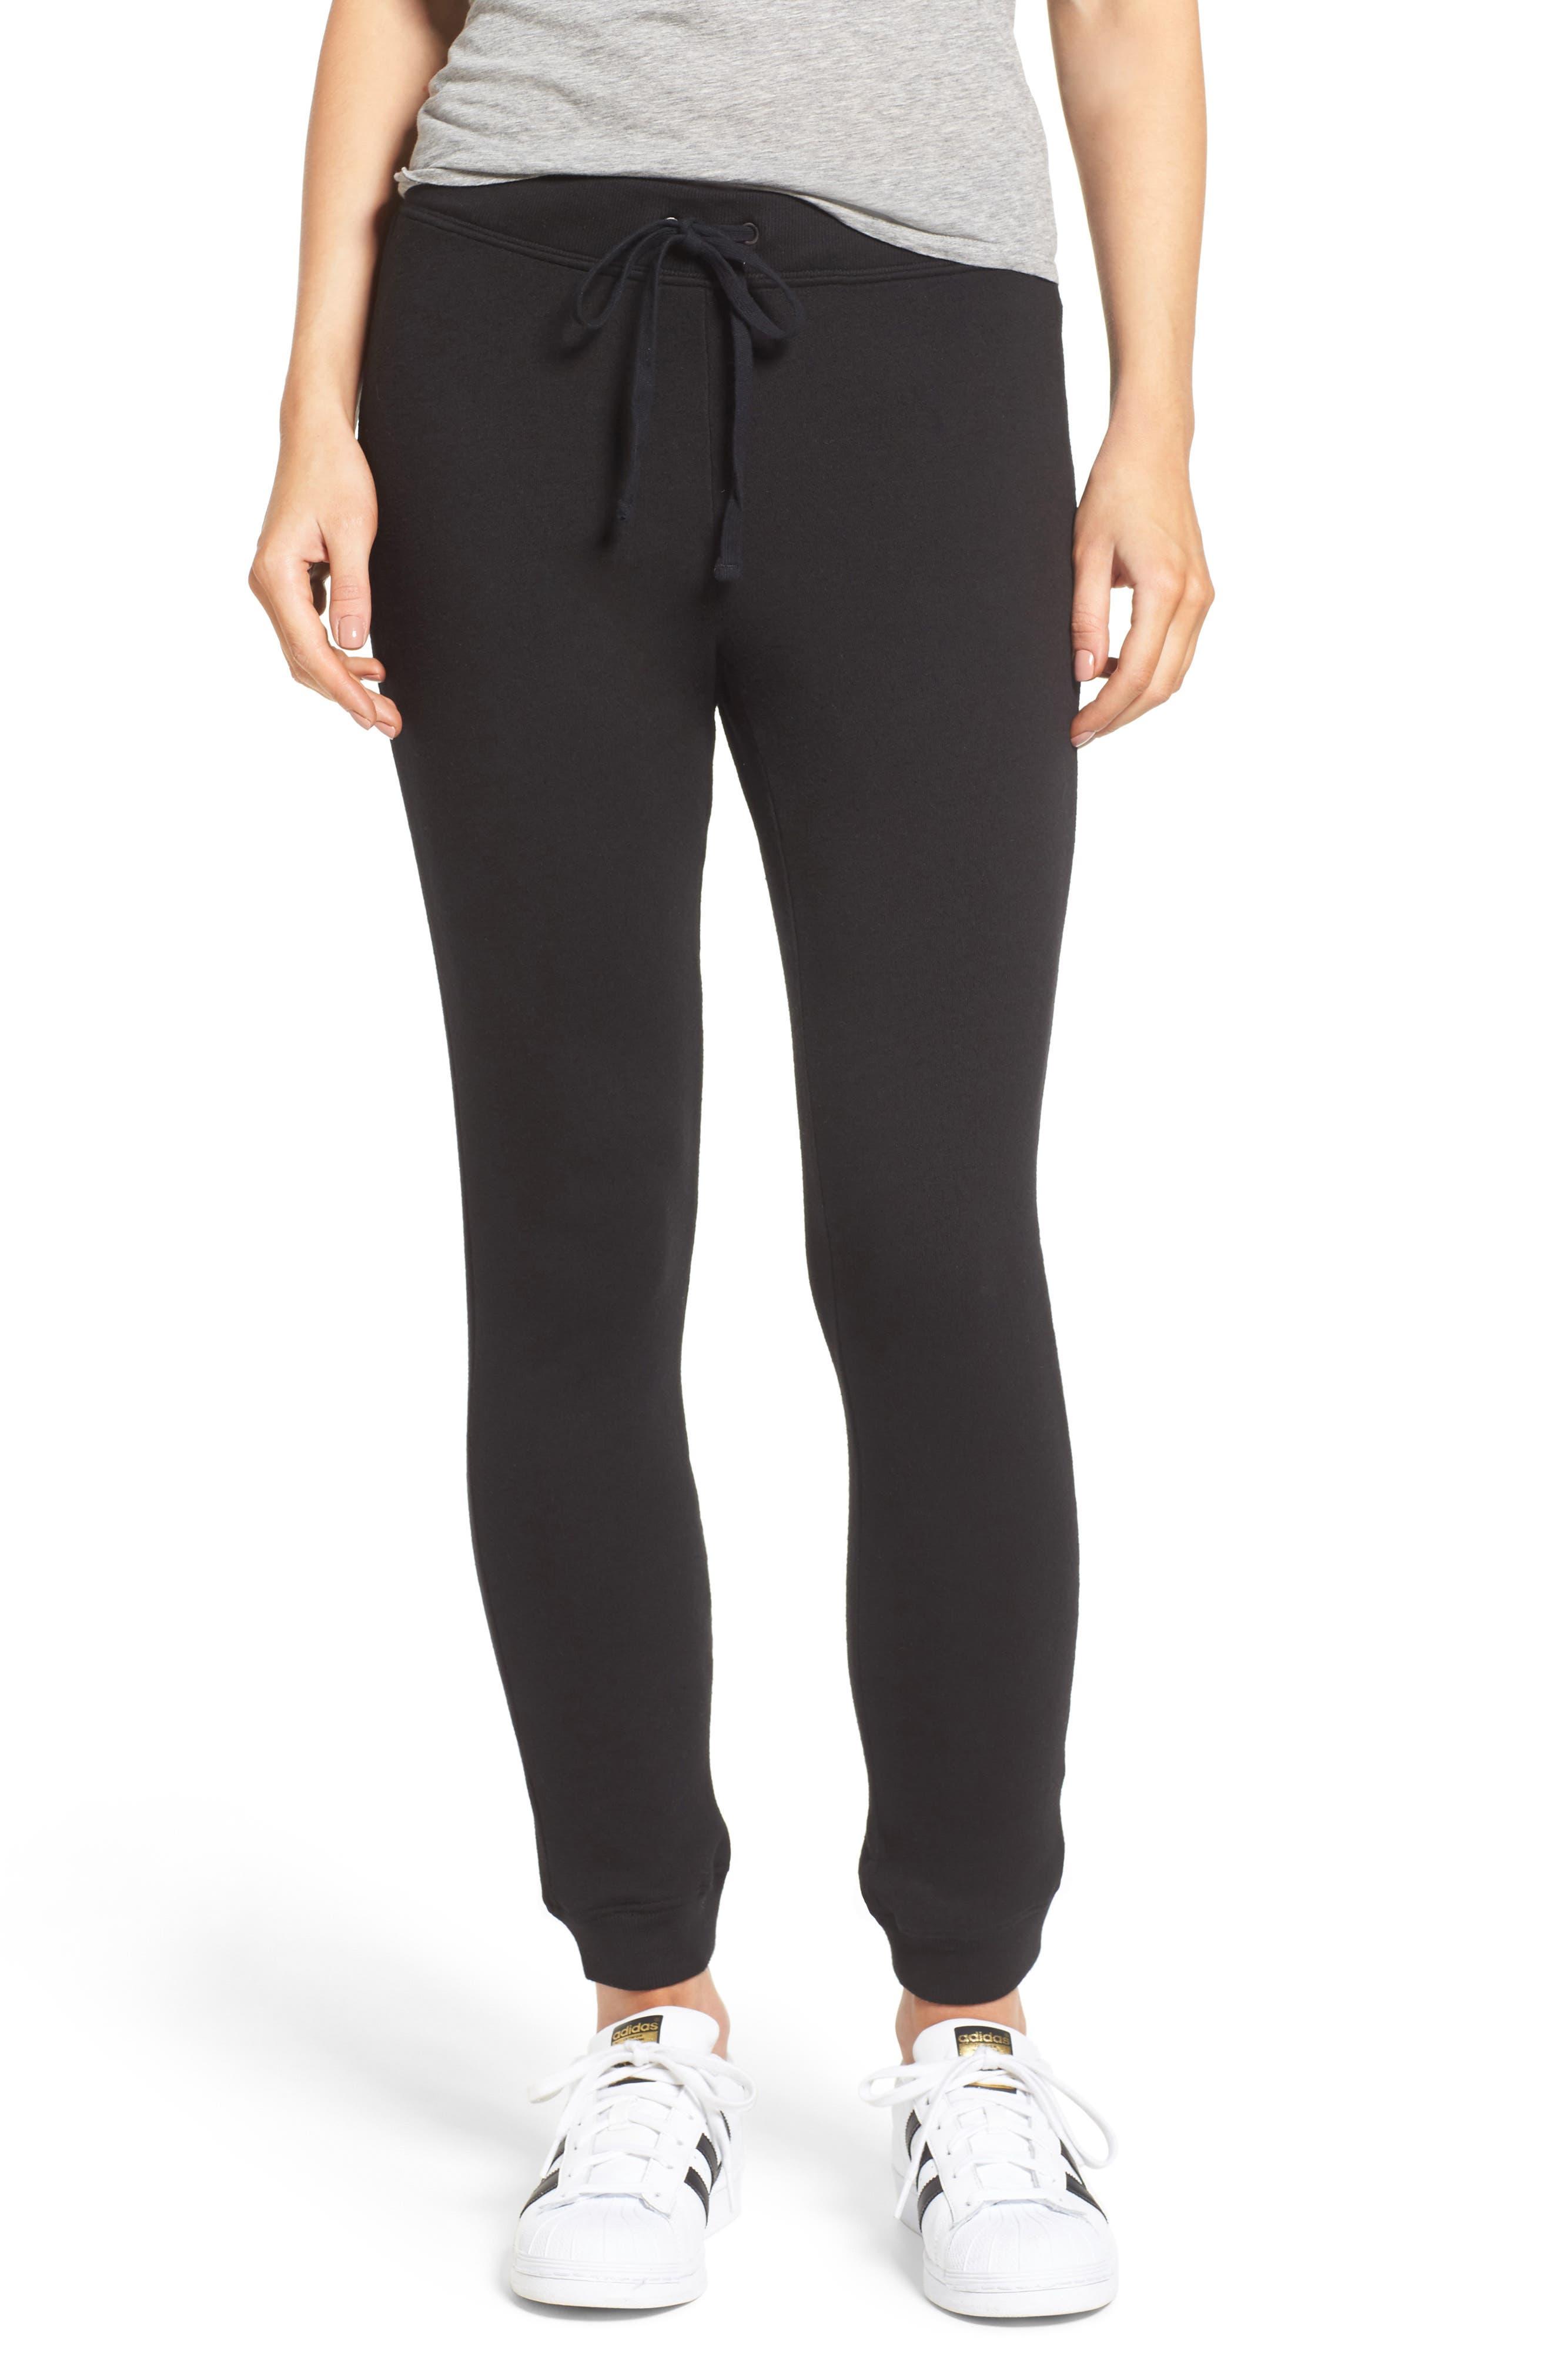 Betsee Distressed Jogger Pants,                         Main,                         color, 001